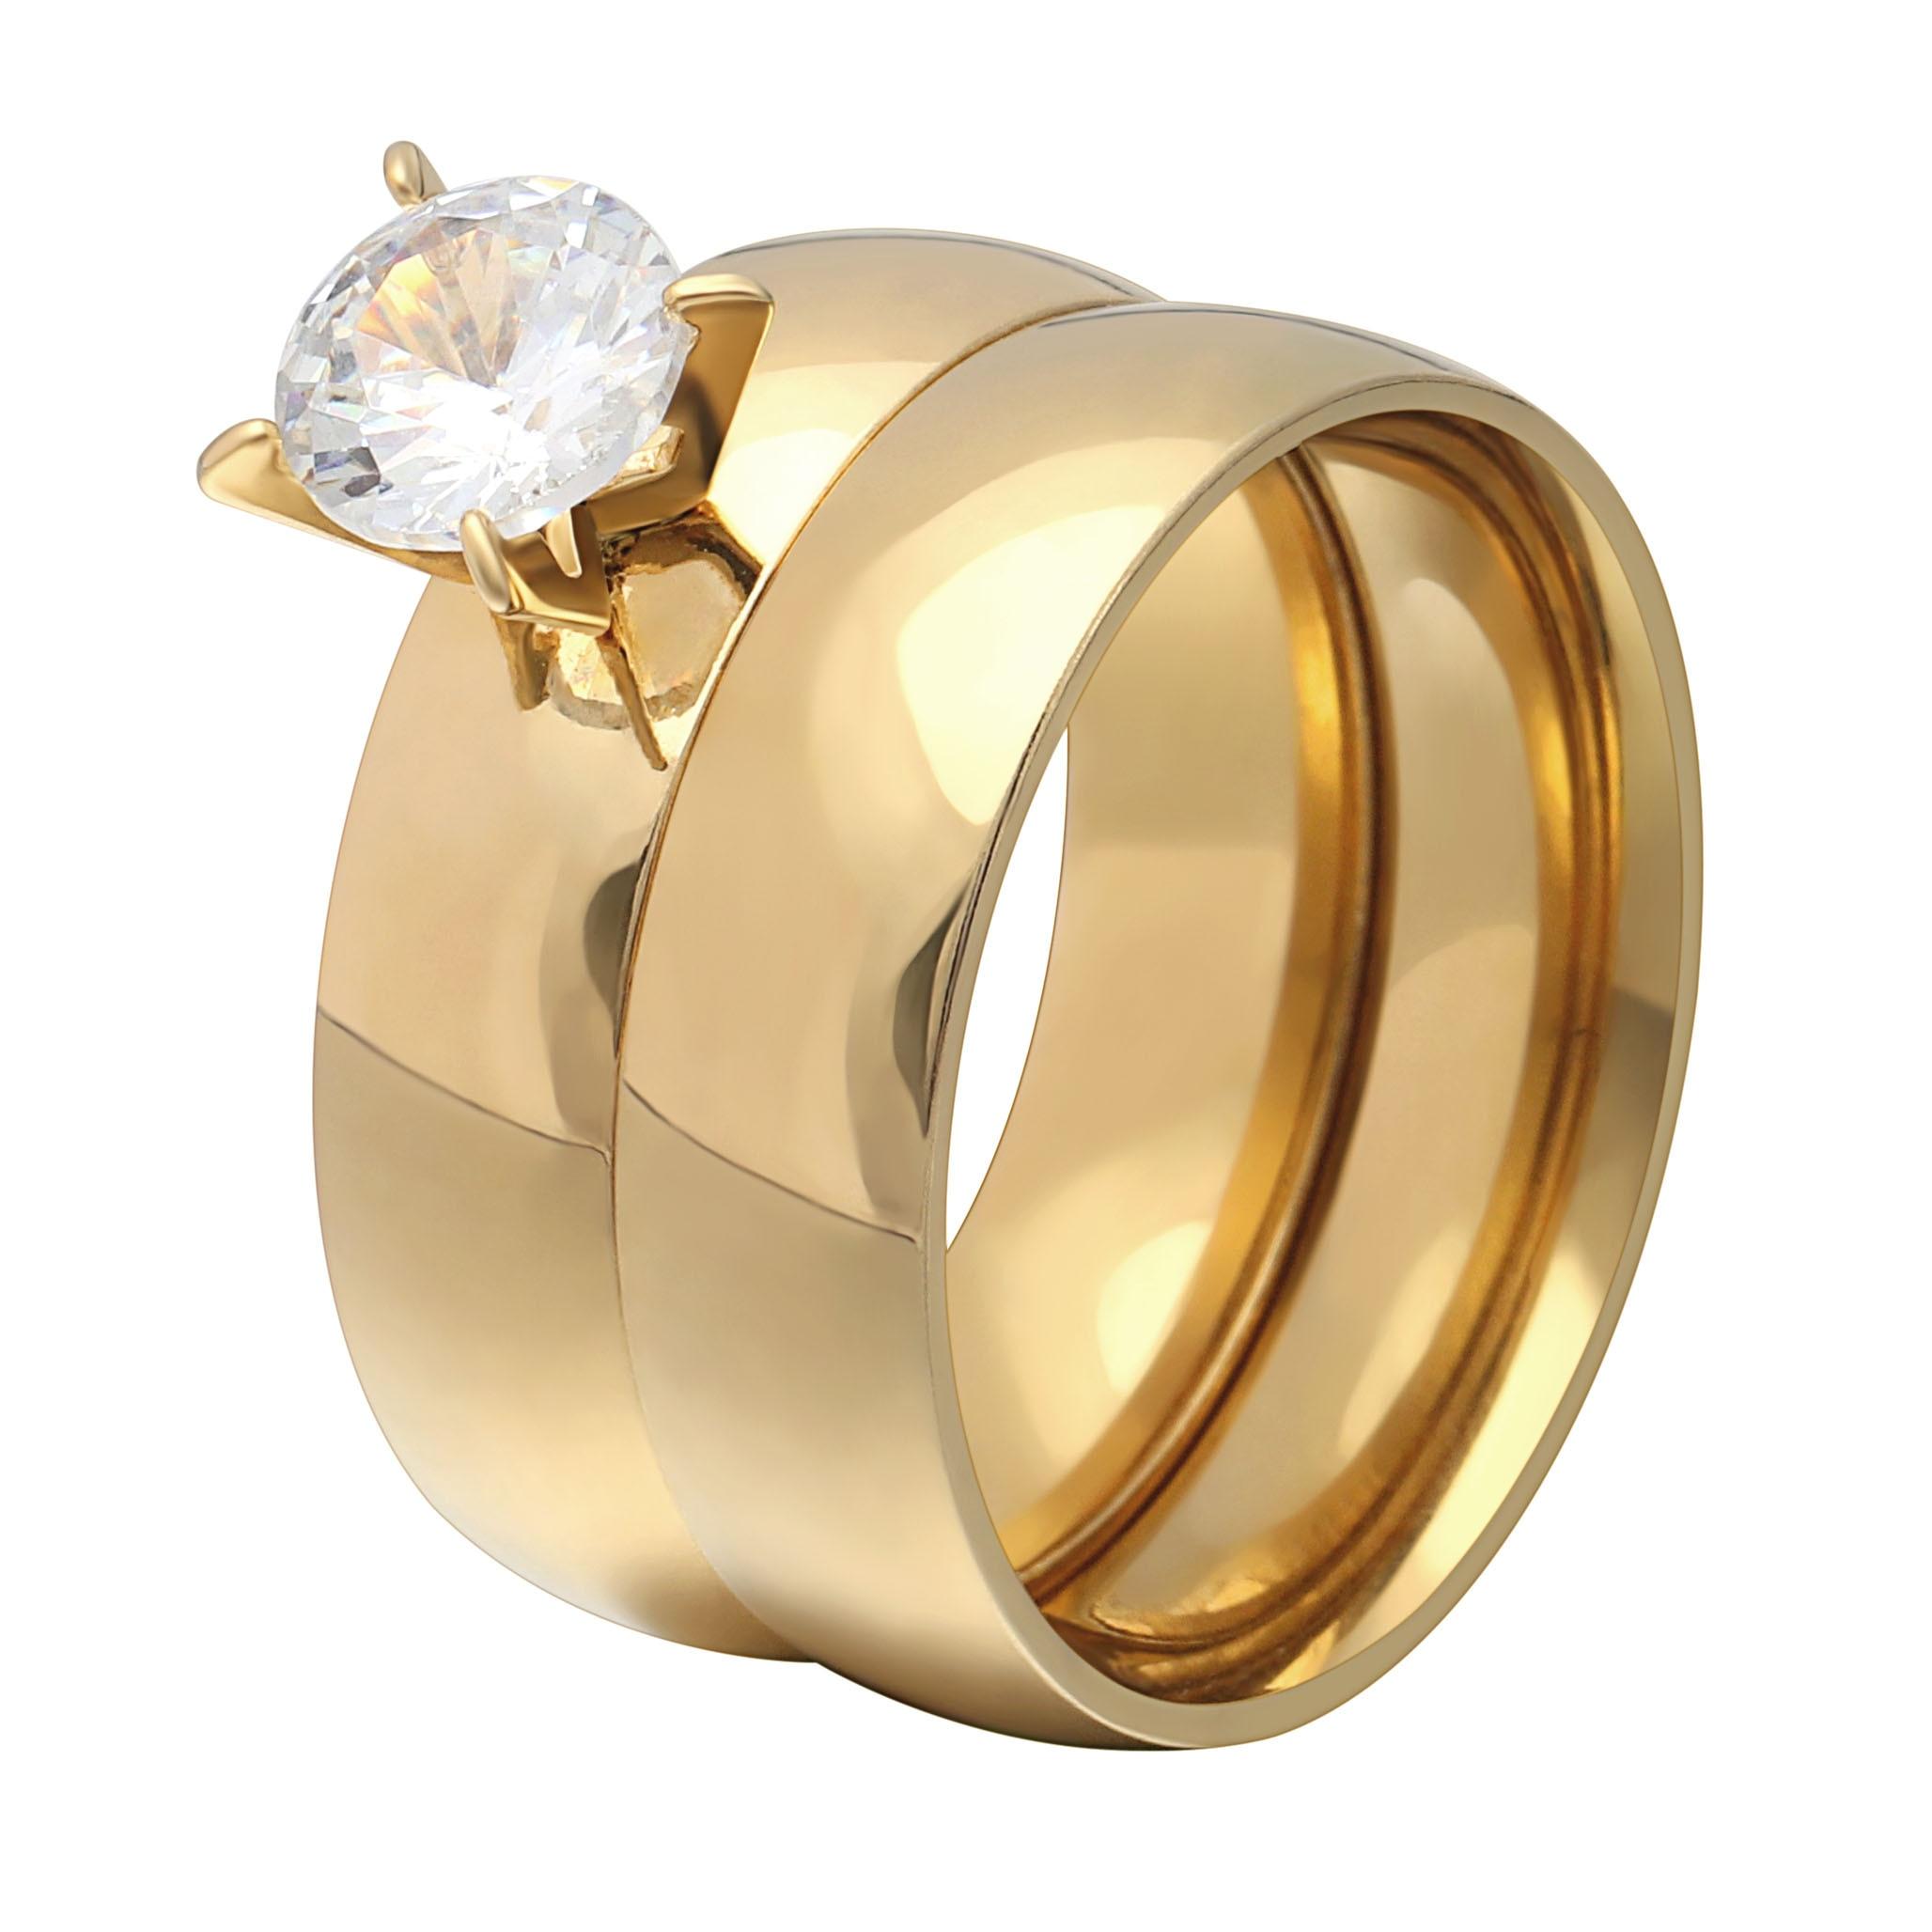 Warna Emas baru Putih 8mm Zircon Stainless Steel Anniversary Wedding Rings untuk Wanita Perhiasan